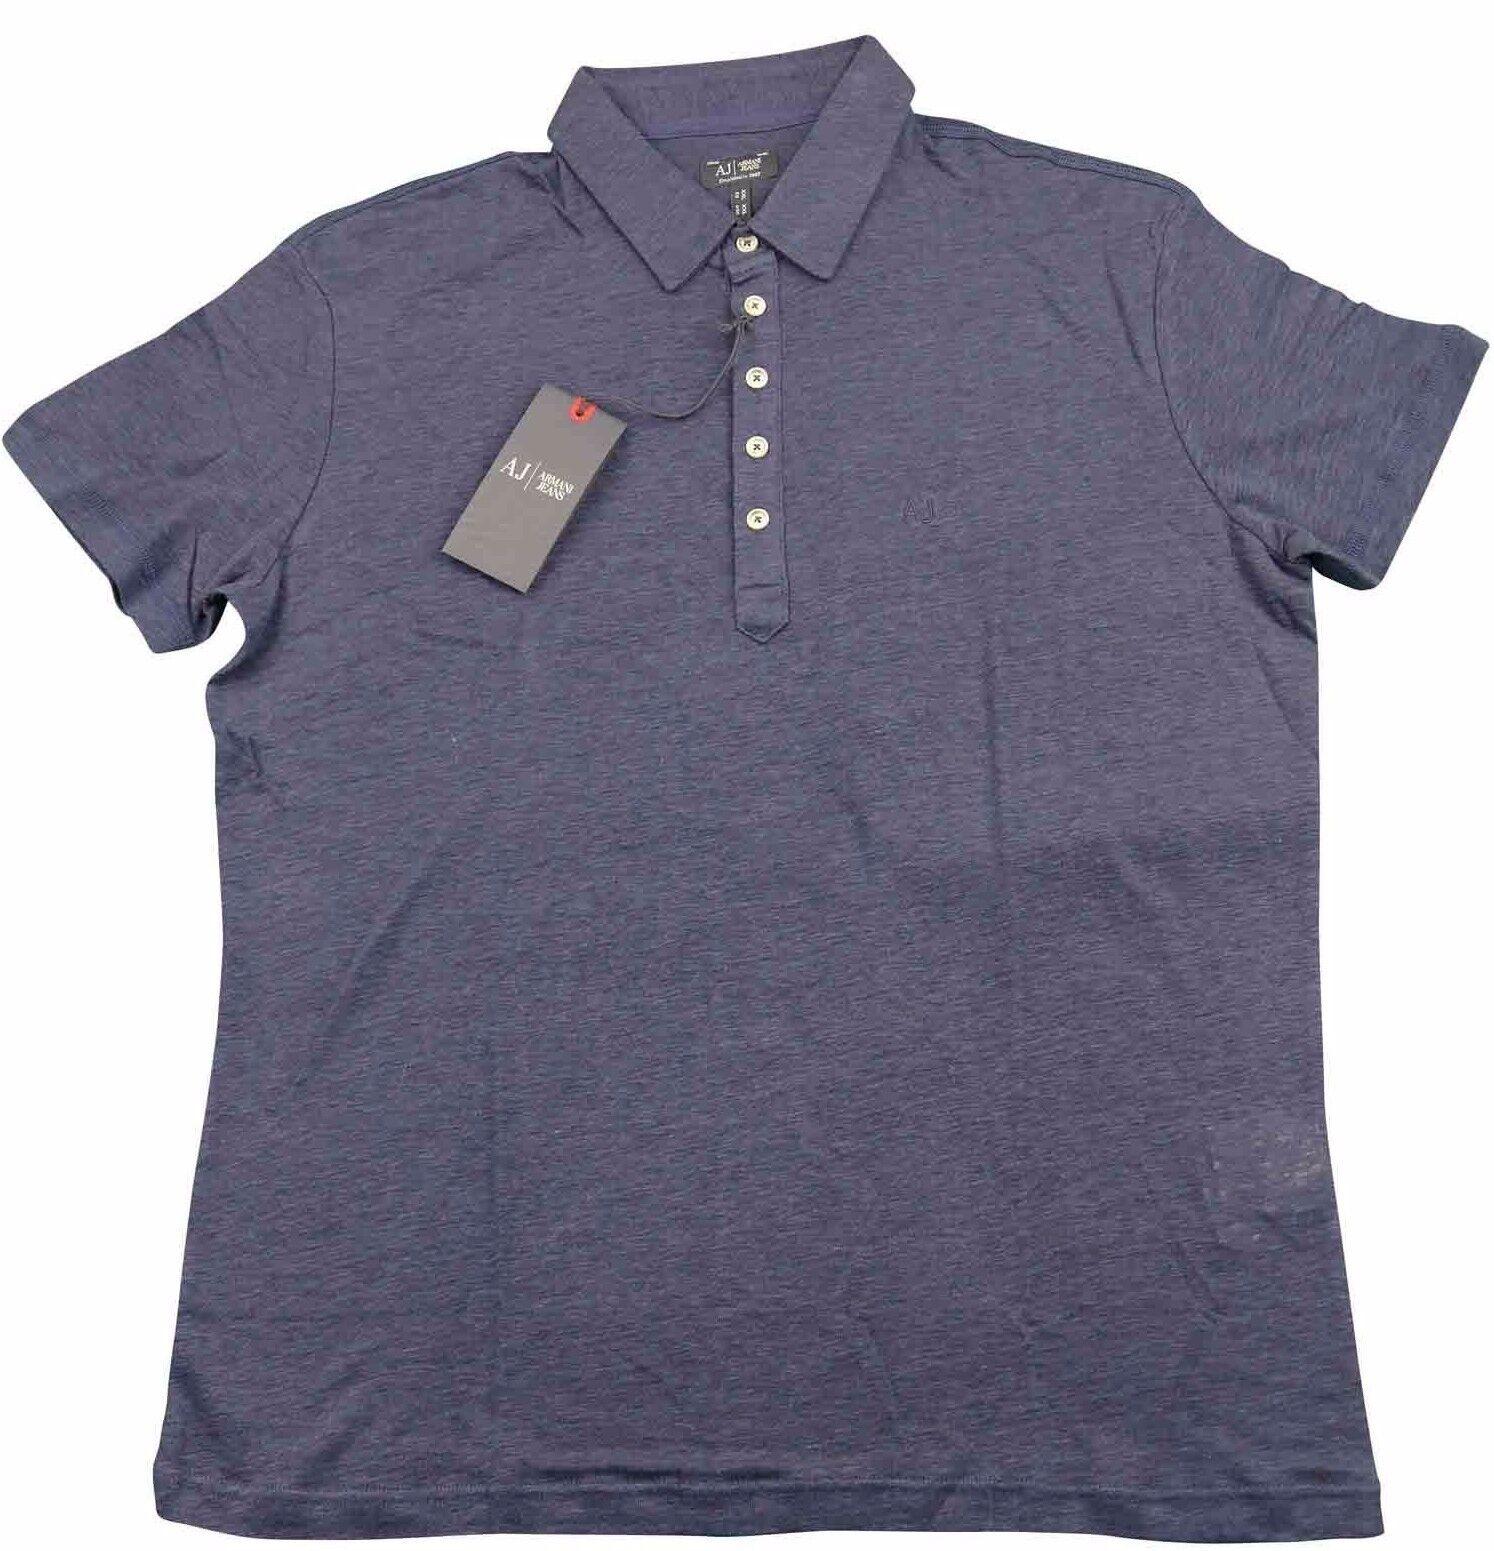 Armani Jeans Mens Navy bluee H S Polo Tshirt - Sz XXL & XXXL BNWT